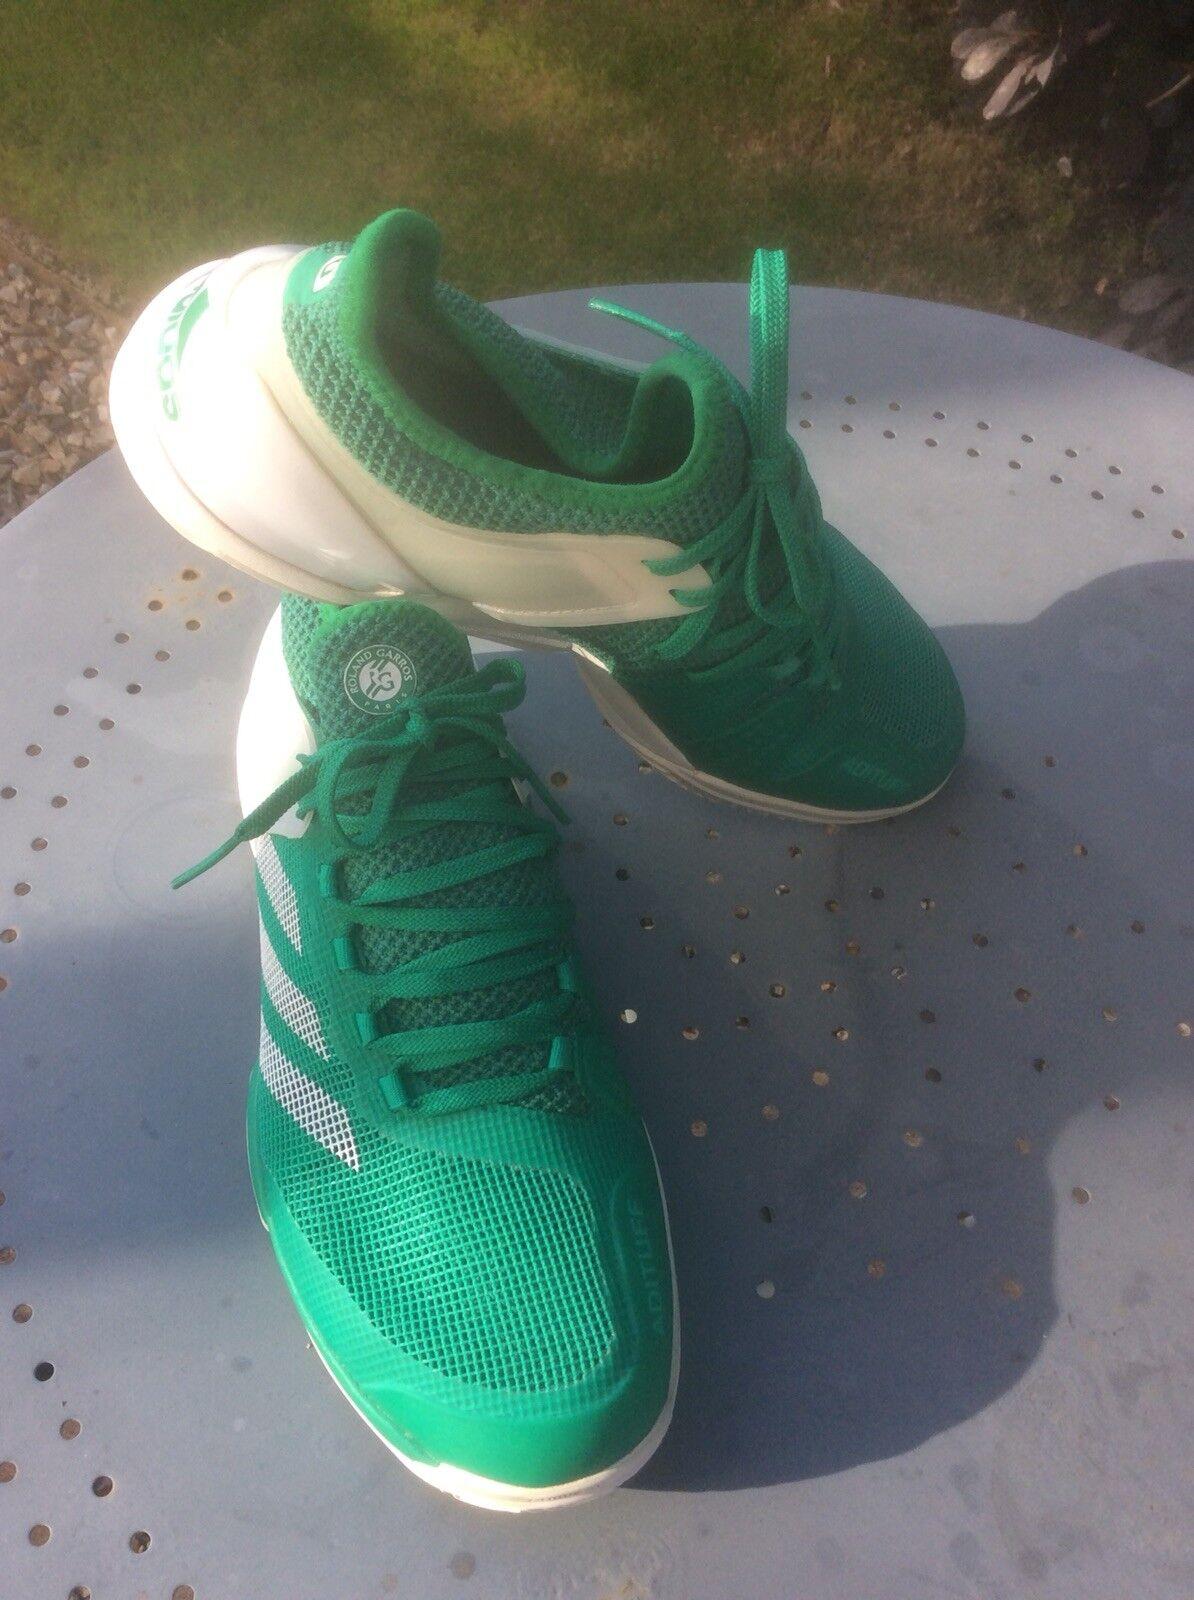 Adidas Zero Feather Roland Garros Tennis shoes